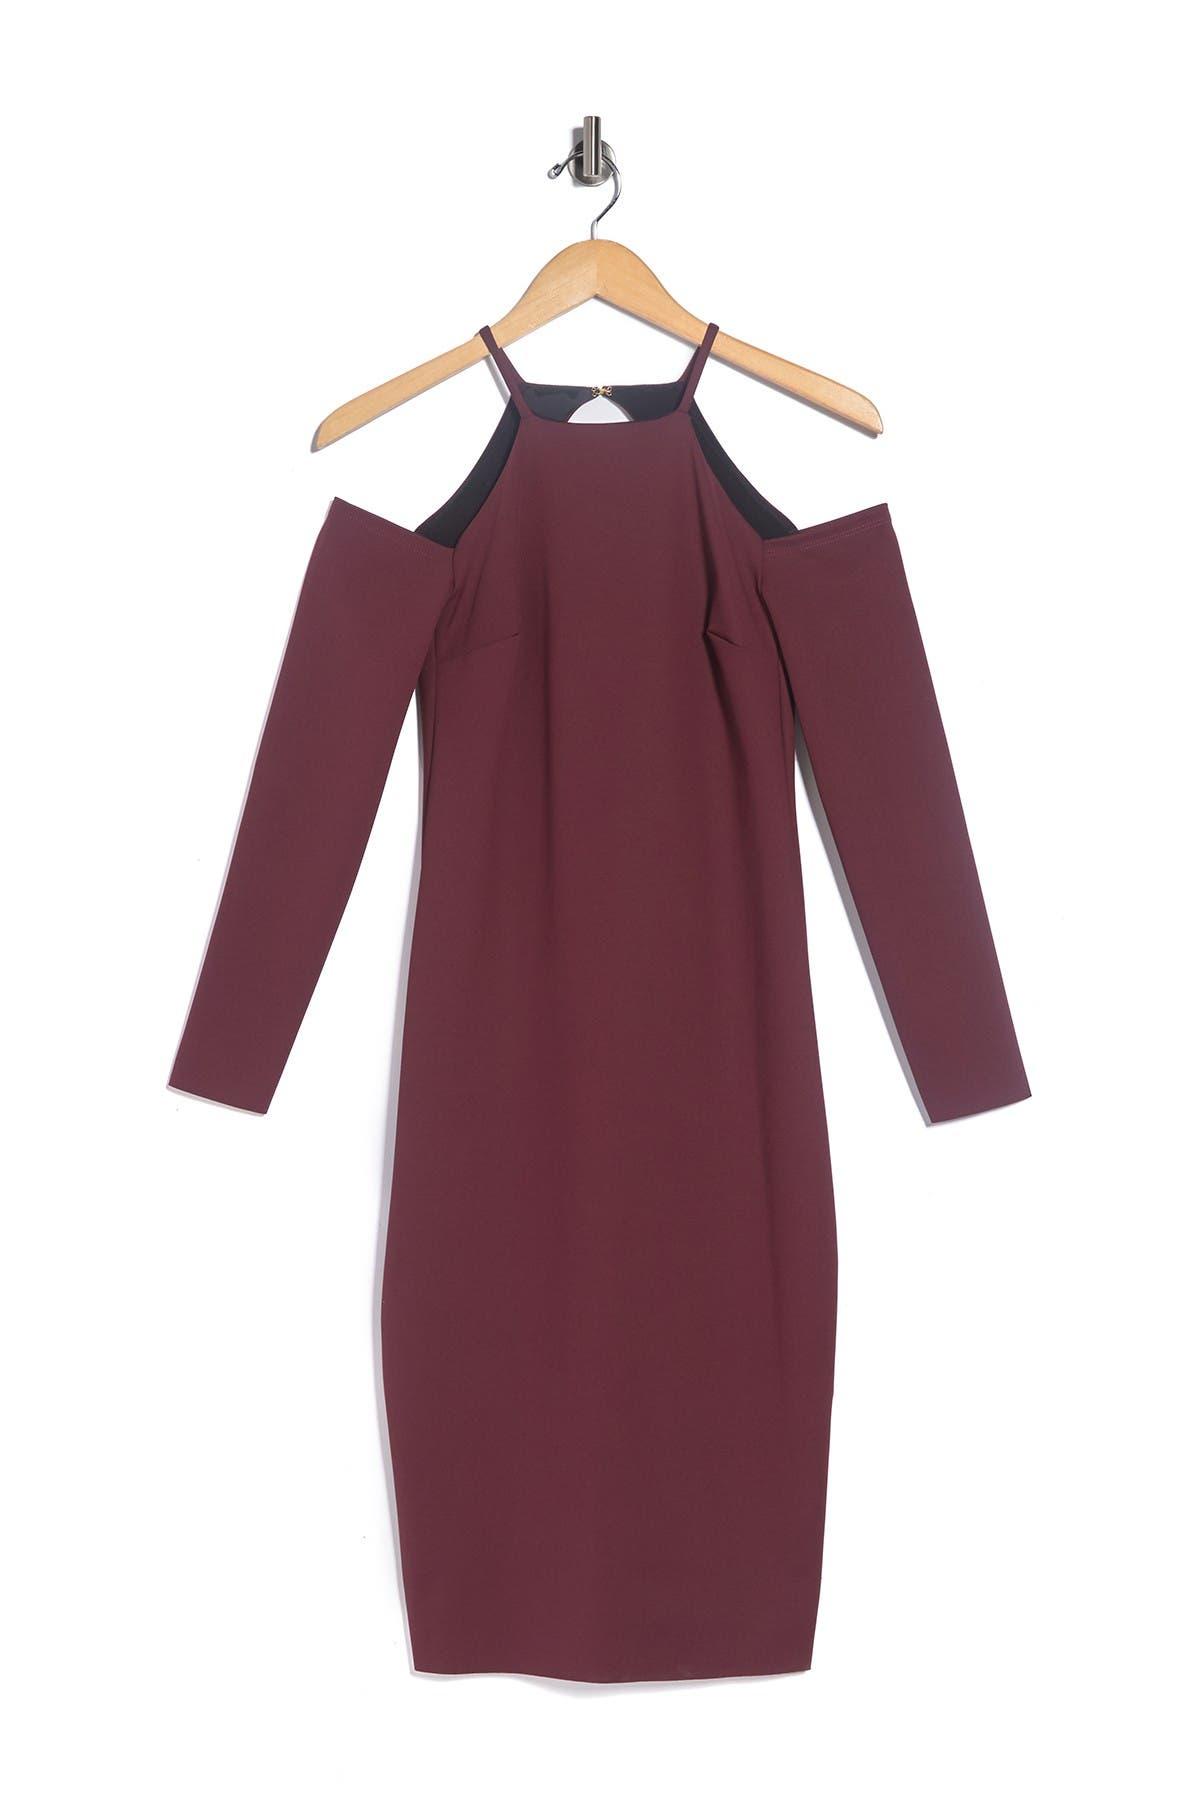 Image of Trina Turk Lu Lu Cold Shoulder Long Sleeve Sheath Dress